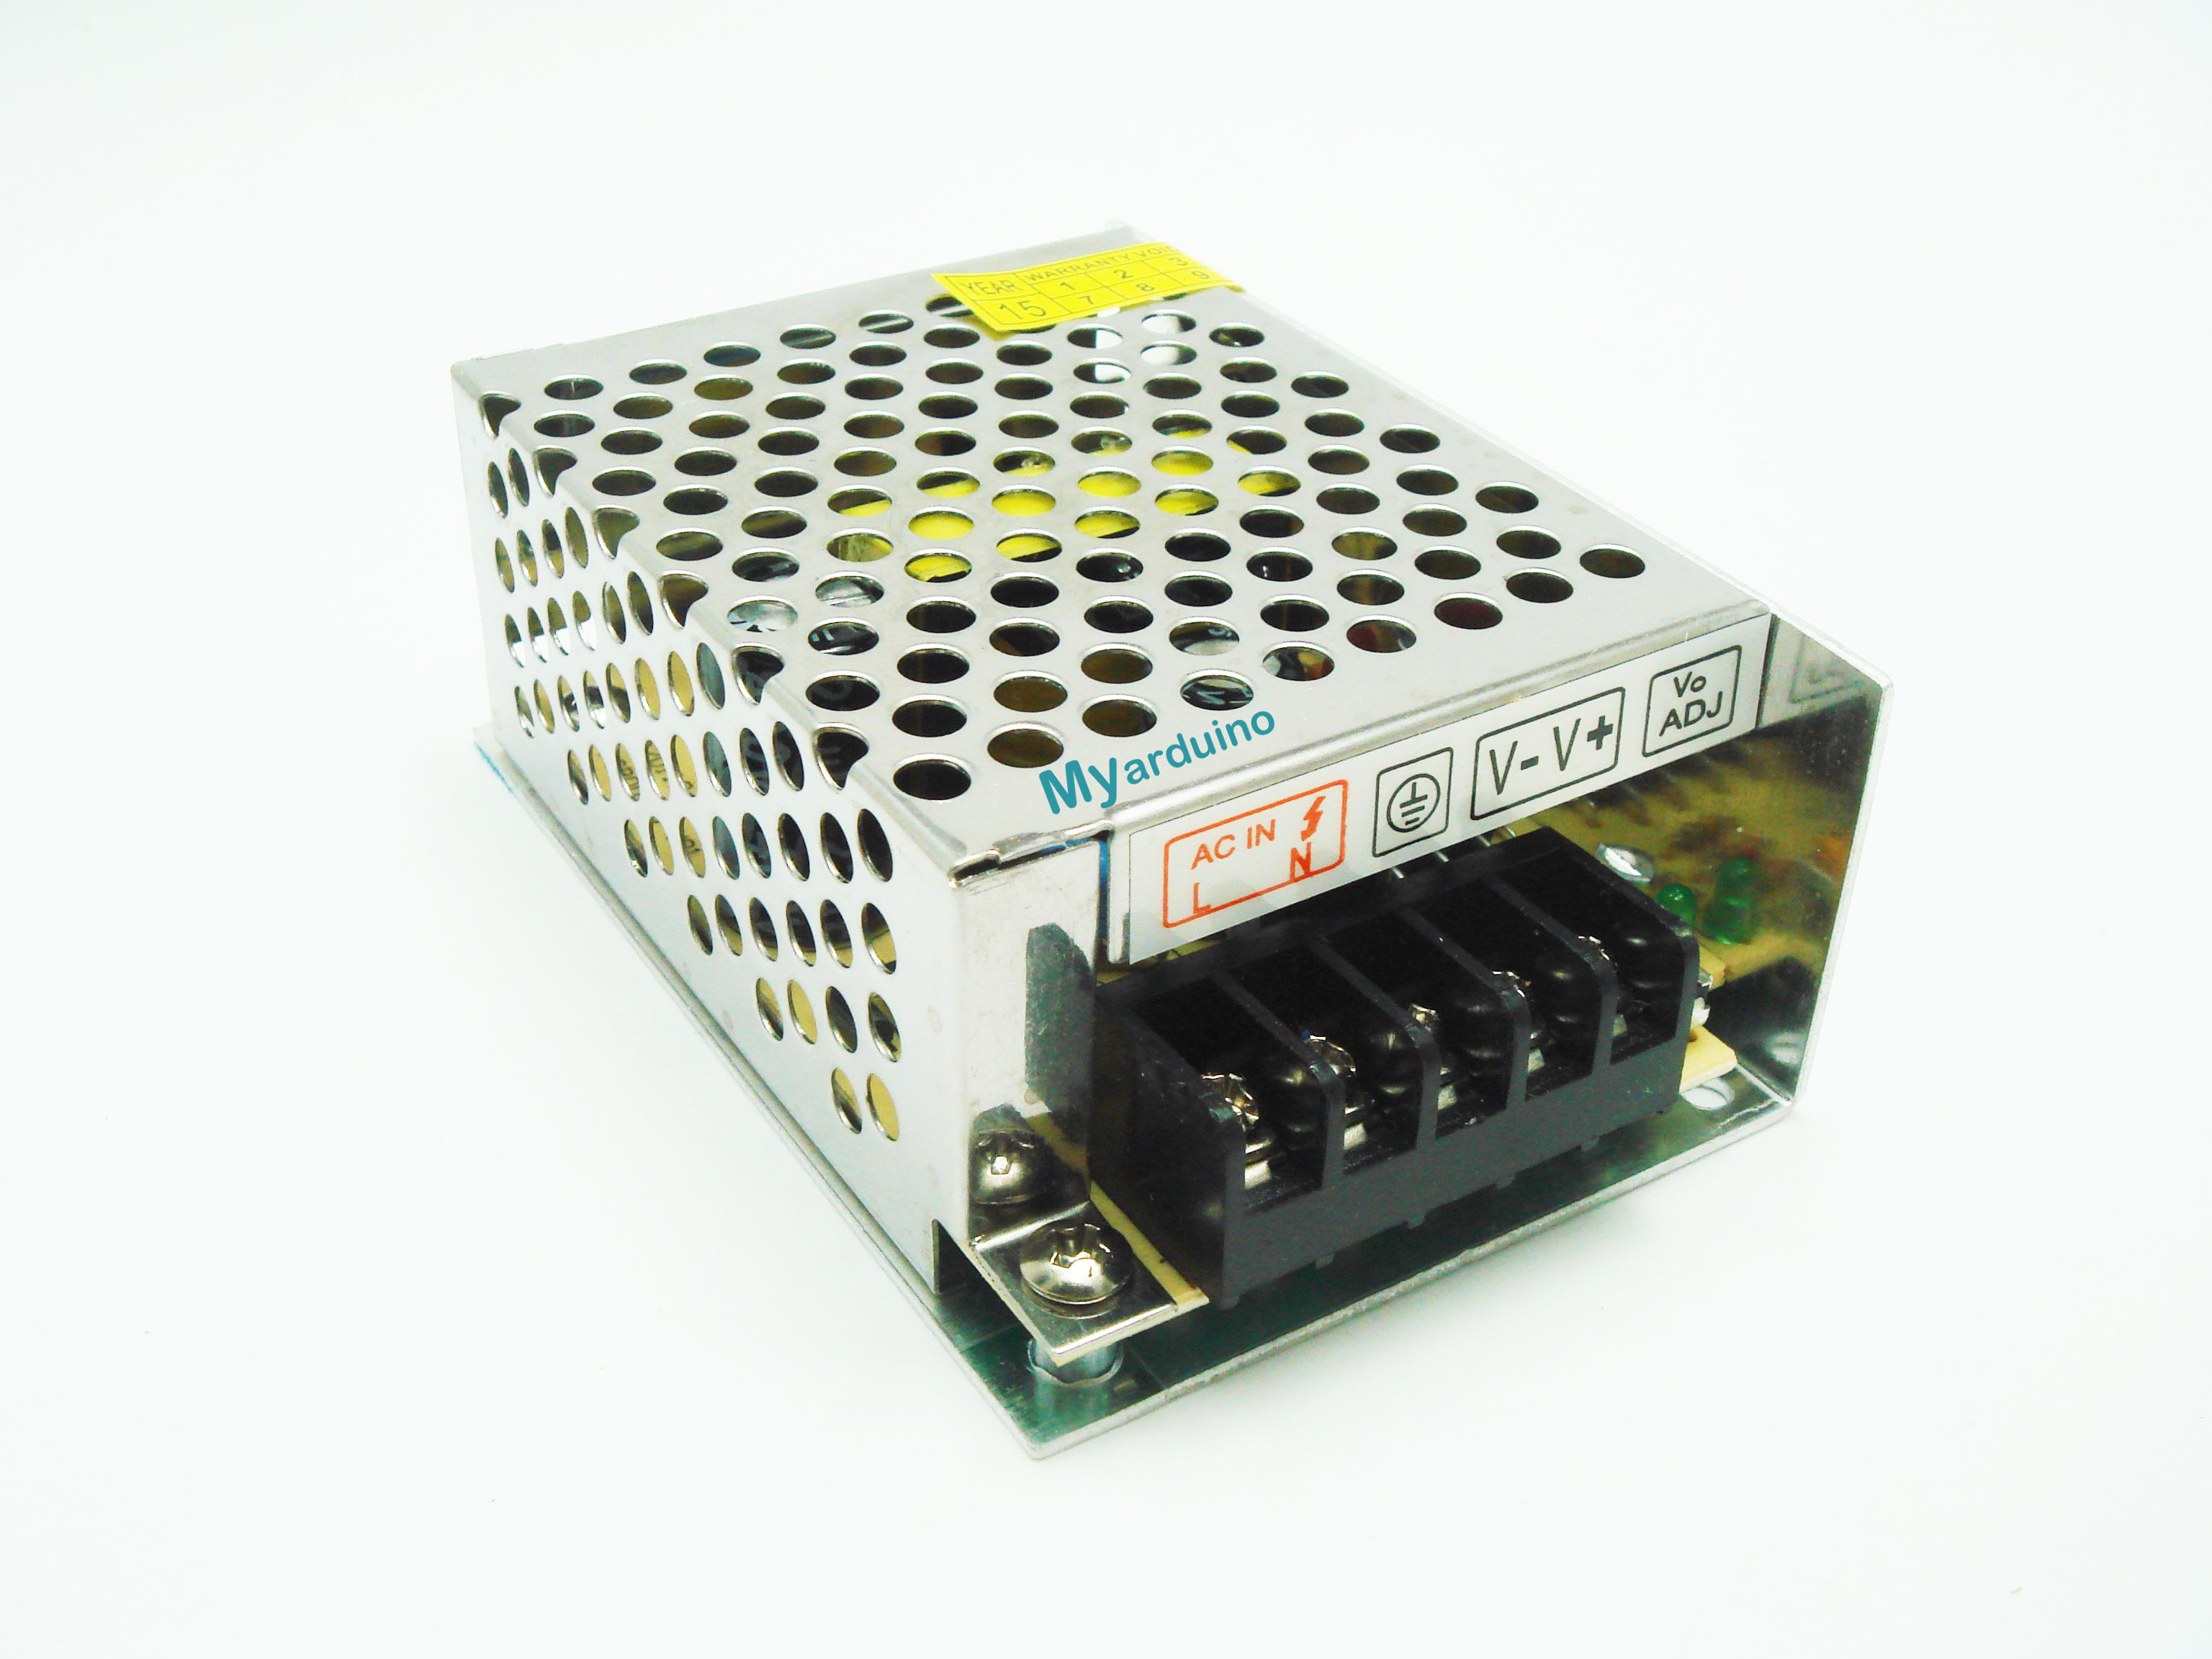 Switching Power supply แหล่งจ่ายไฟ 24V 2A